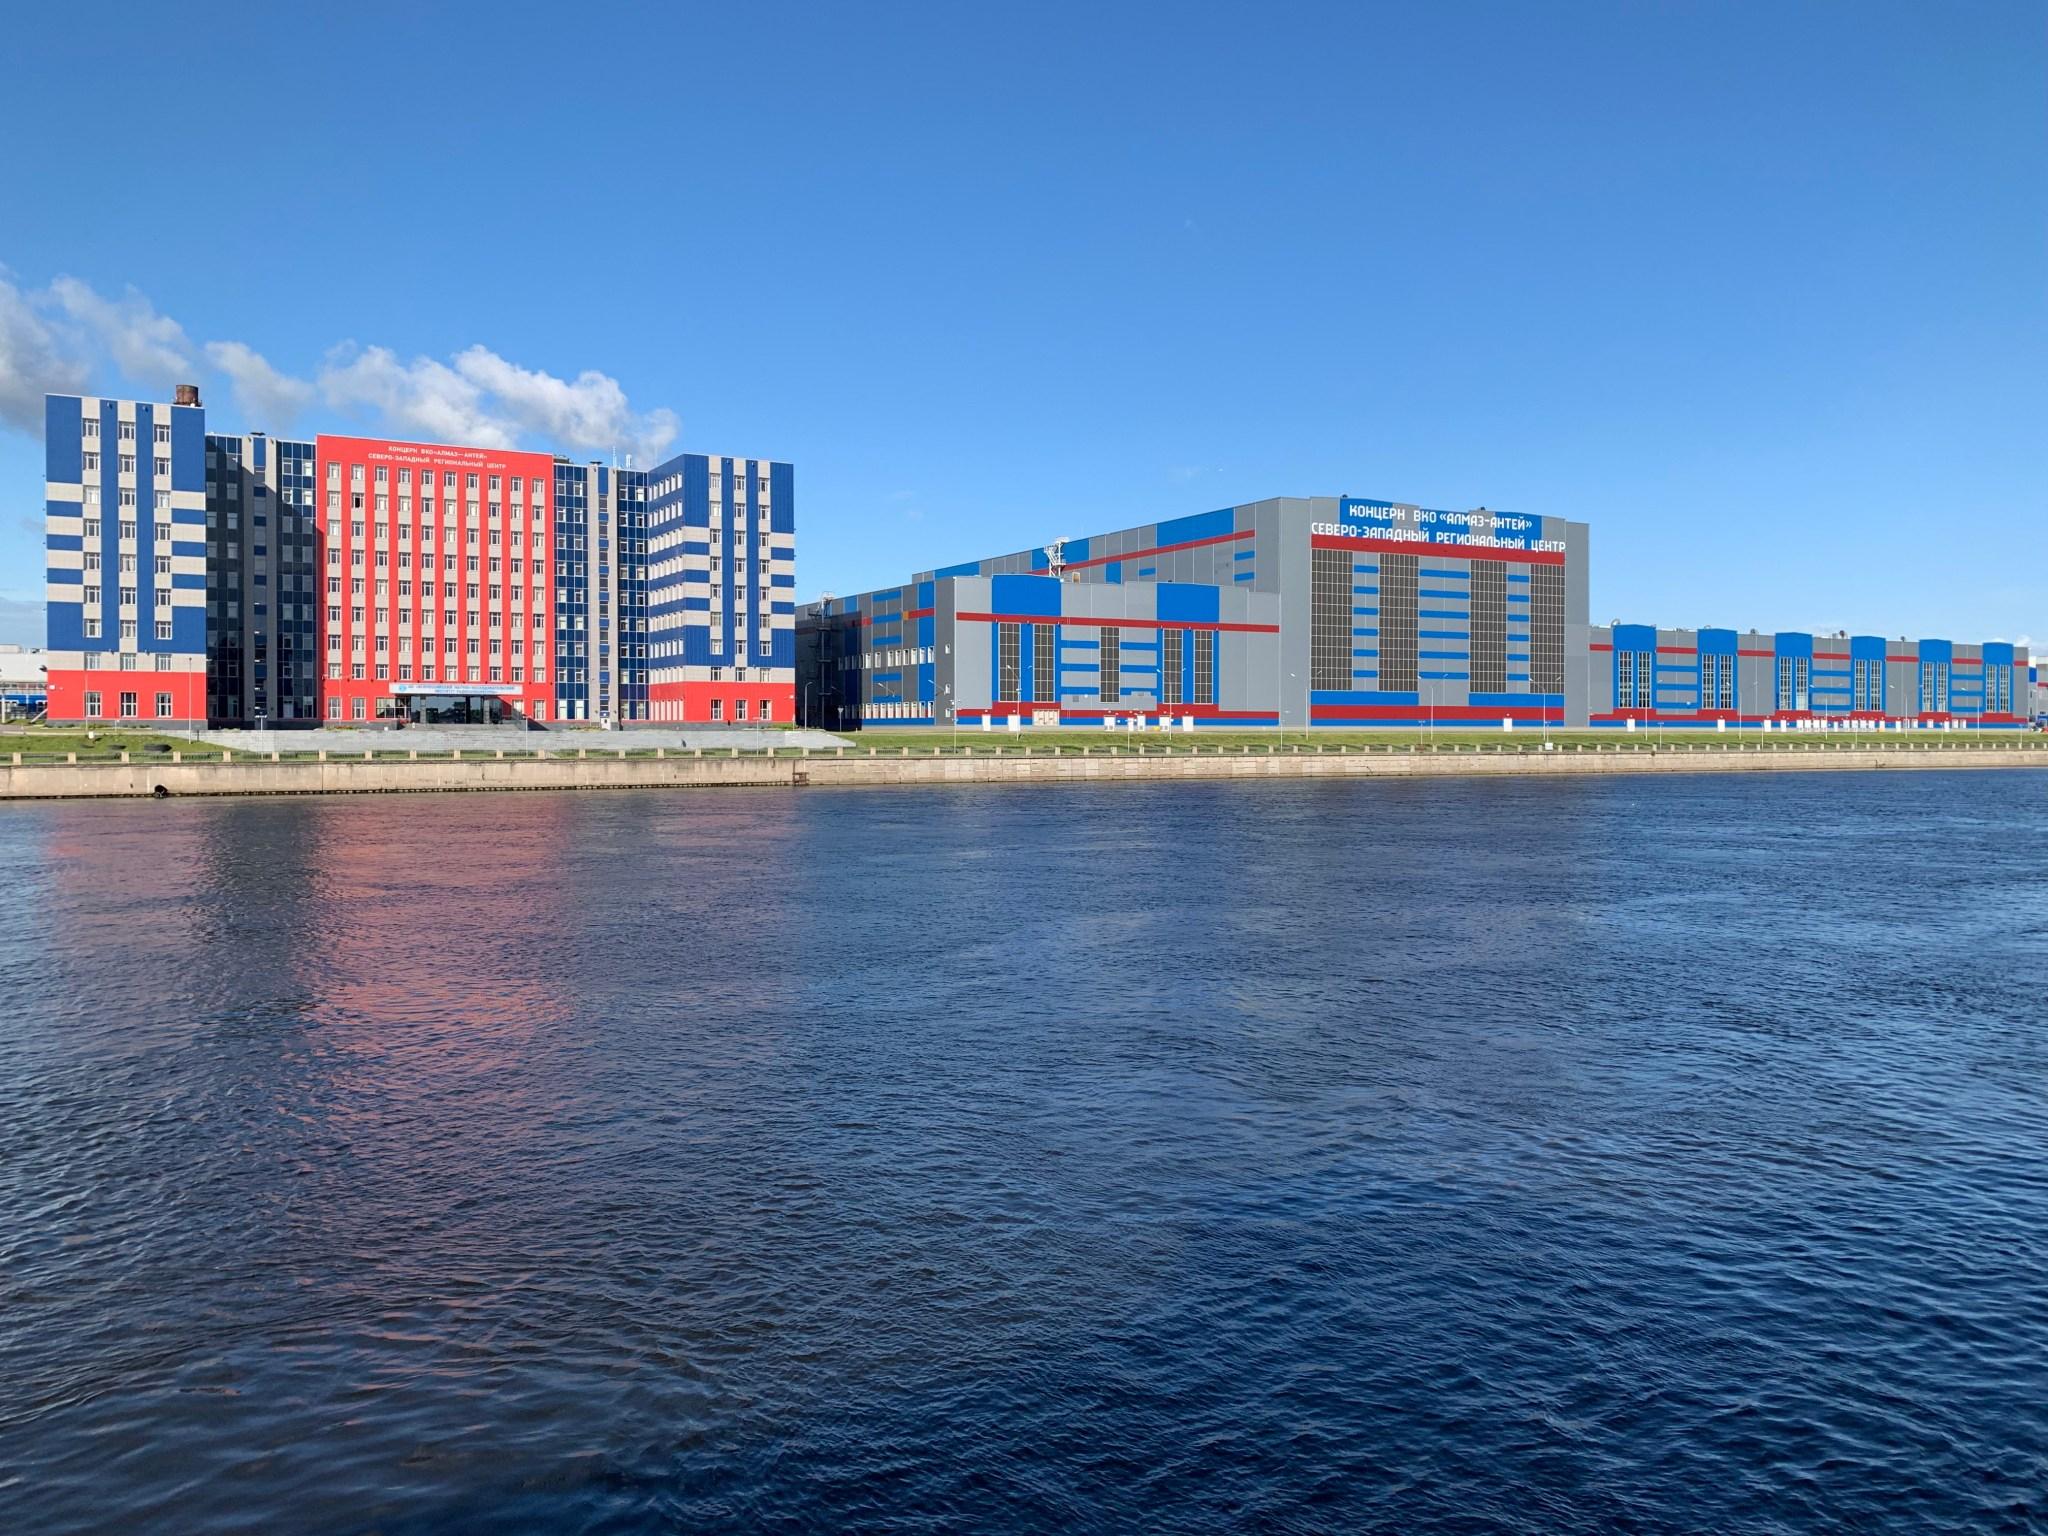 Buildings along the Neva River